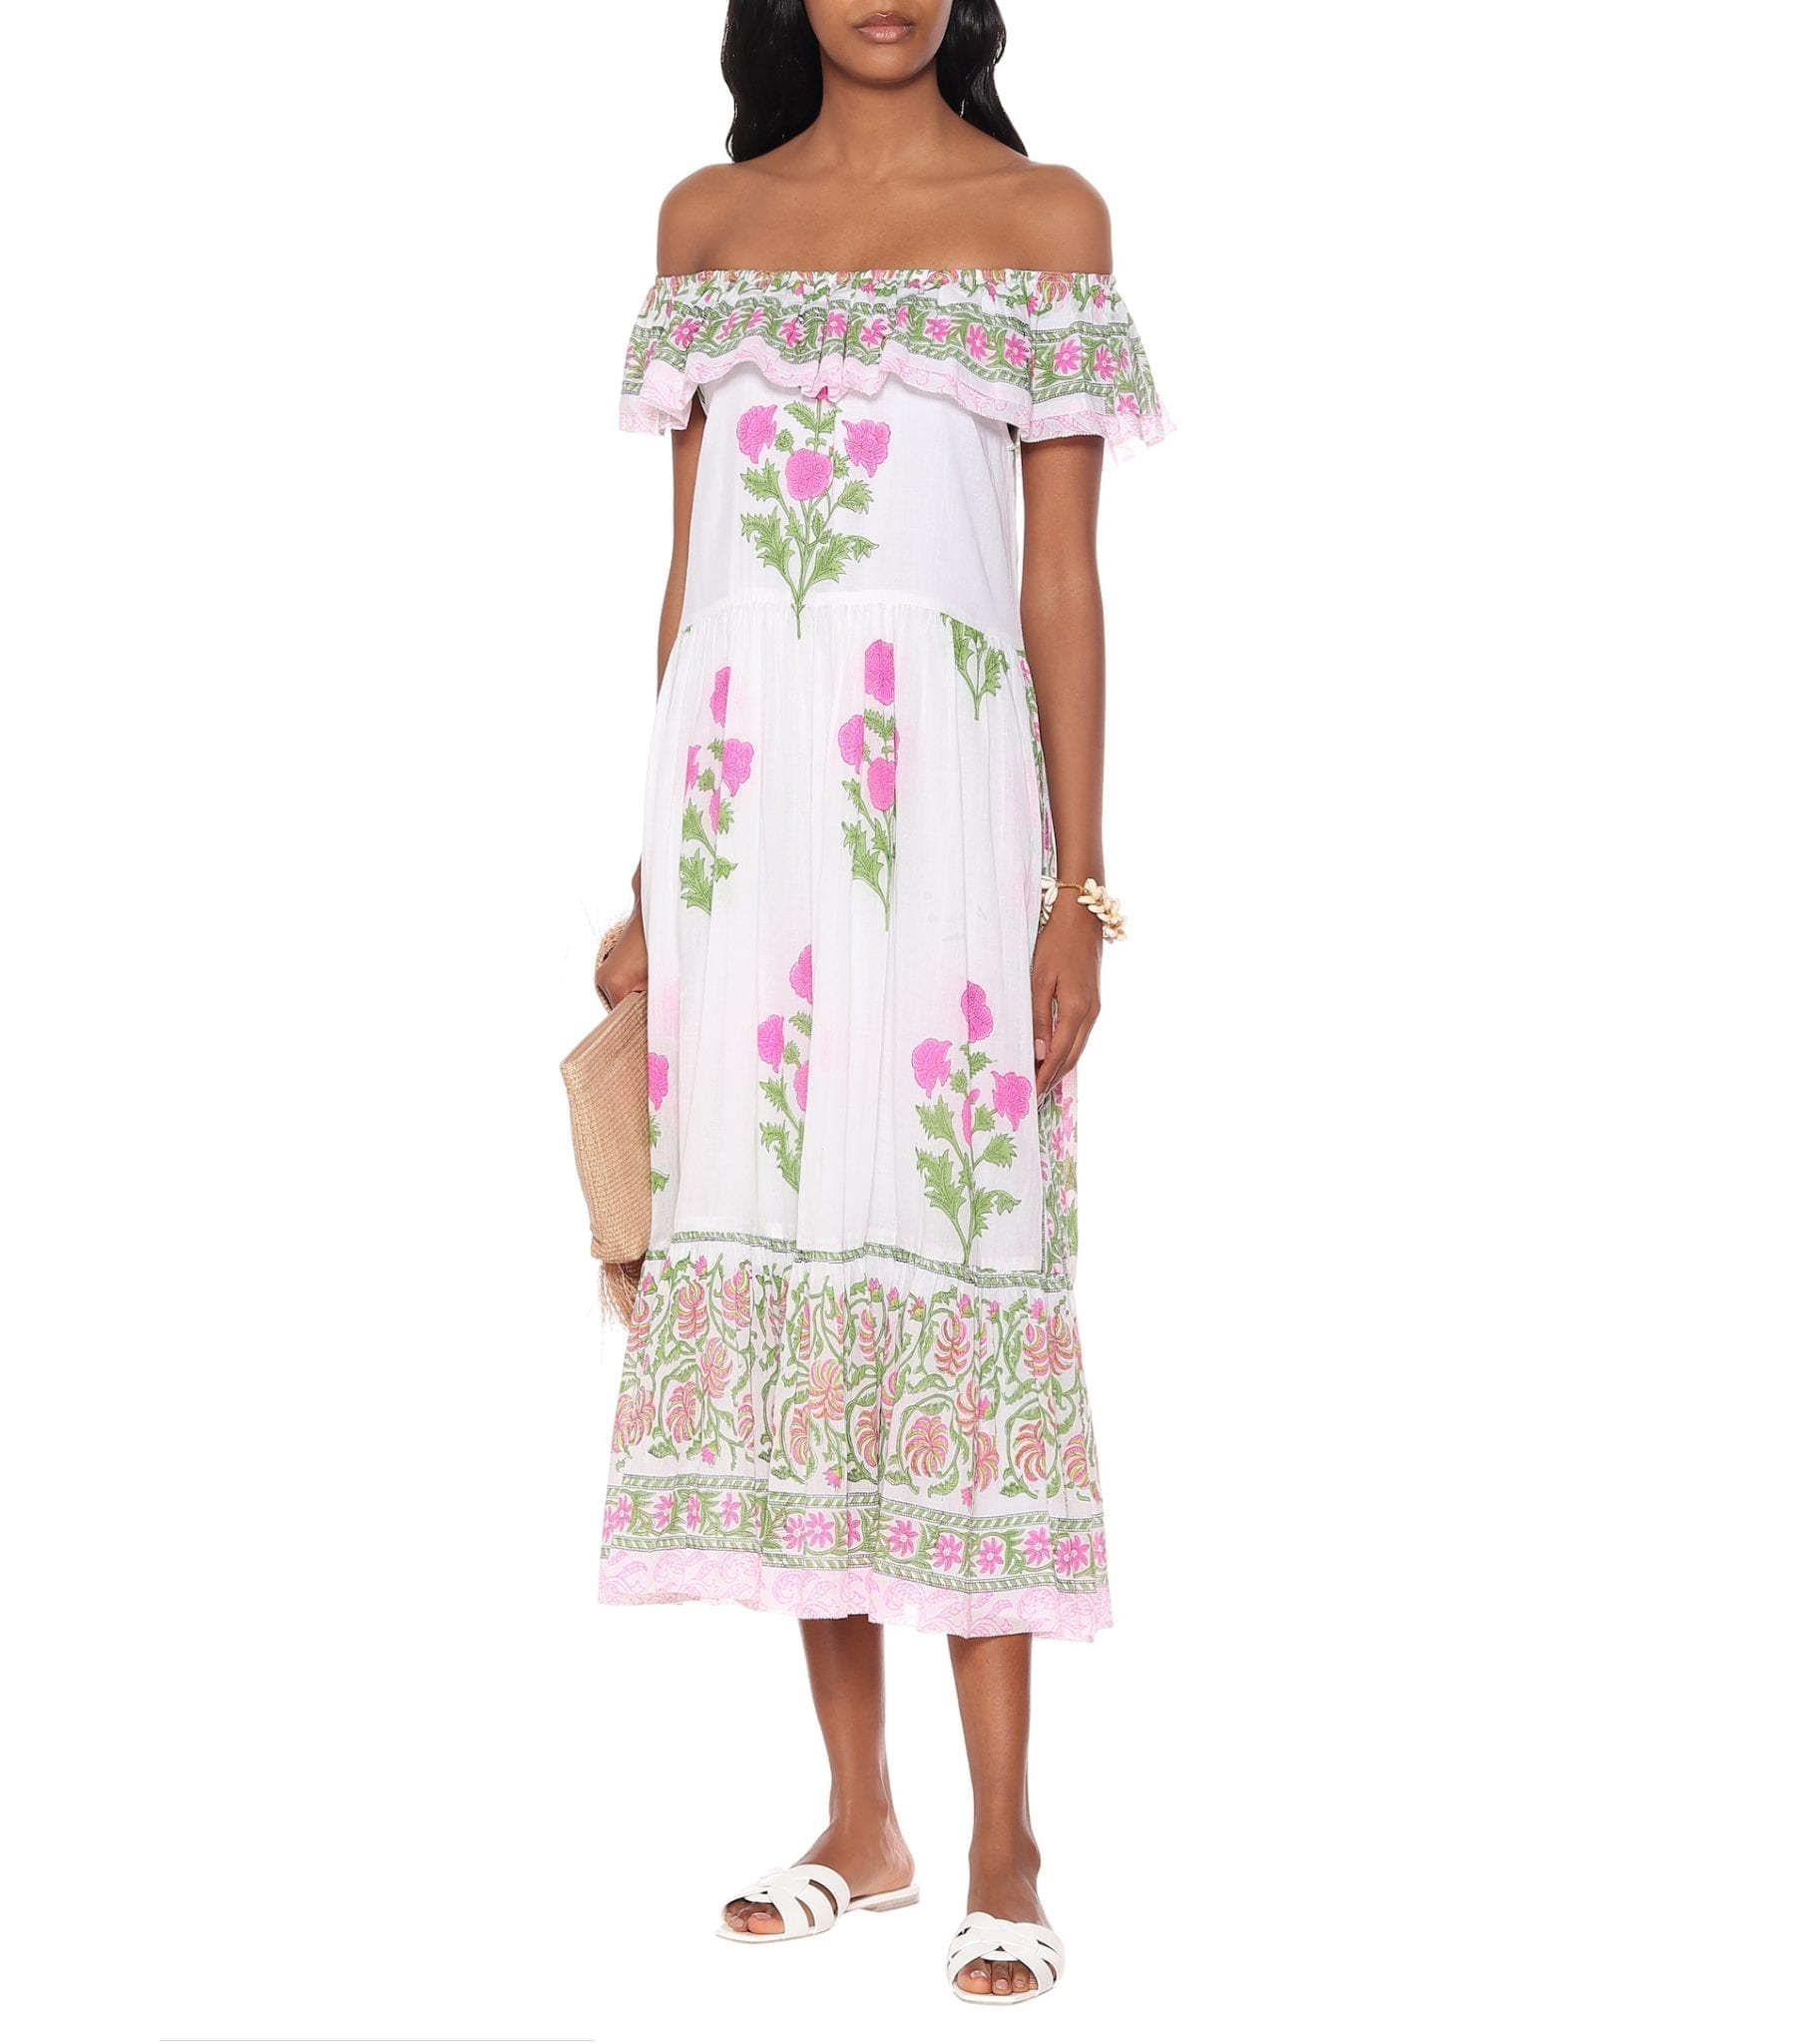 JULIET DUNN Off-the-shoulder Floral Cotton Dress